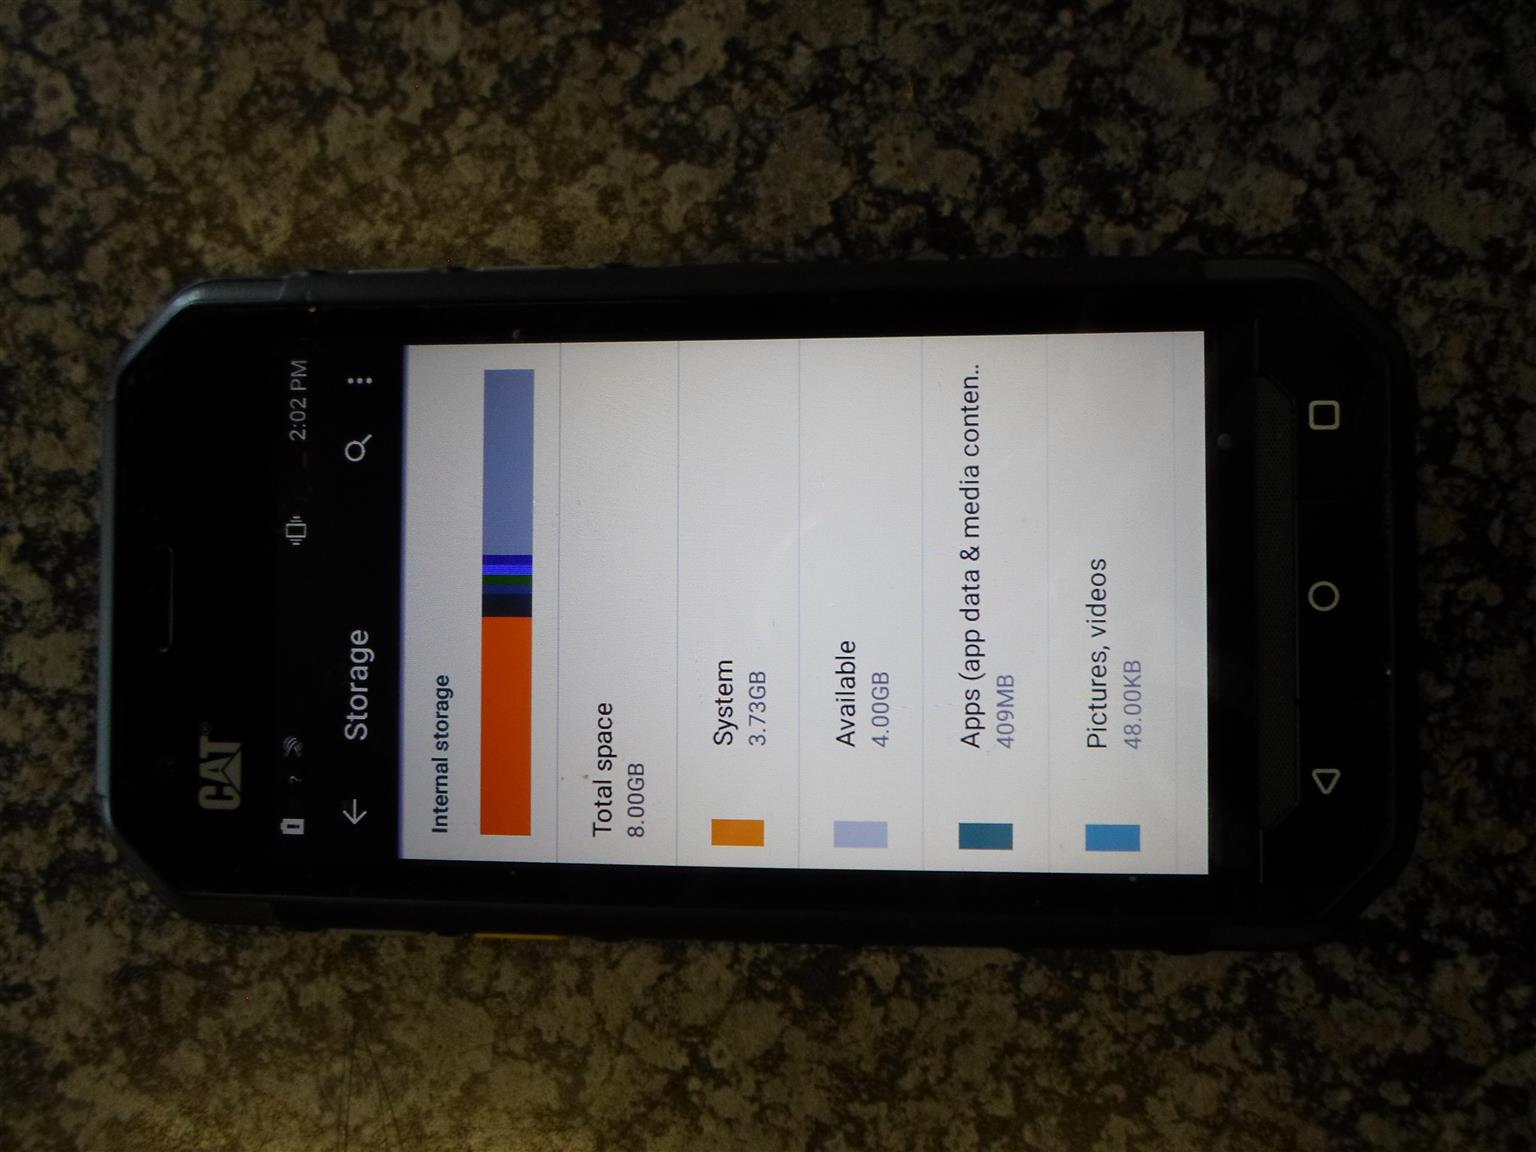 8GB CAT S30 Cellphone